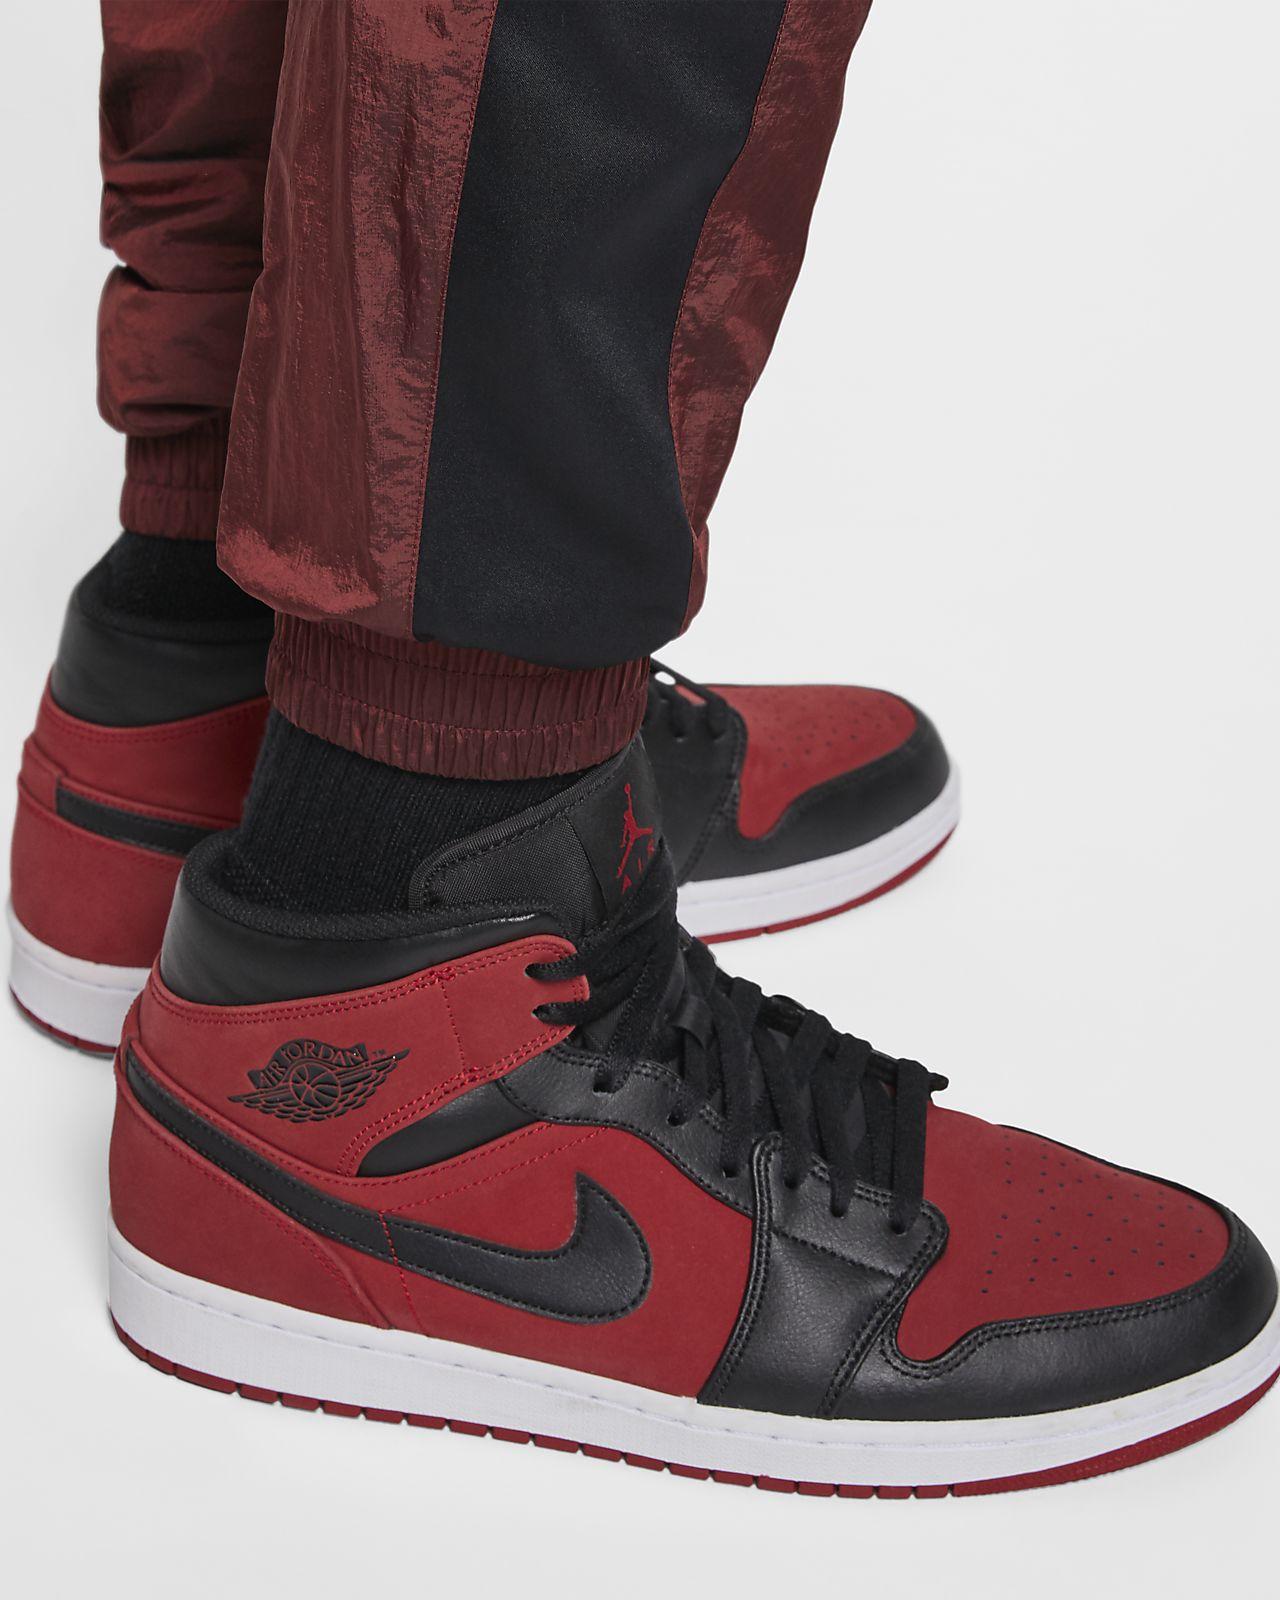 wholesale dealer 8b7b5 b3025 ... Jordan Flight Warm-Up Trousers